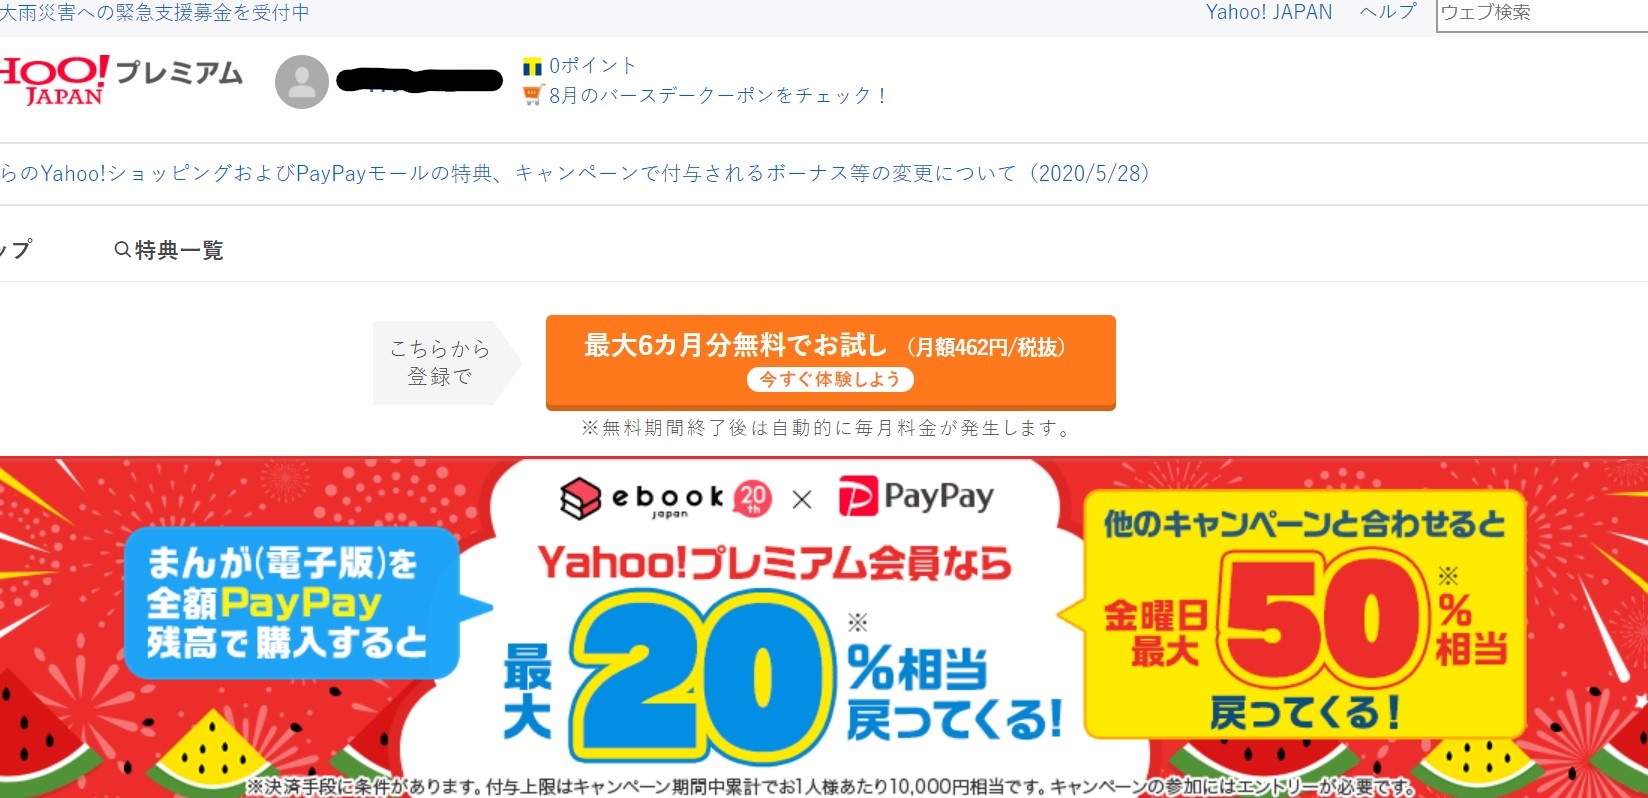 Yahoo(ヤフー)プレミアム会員登録画面